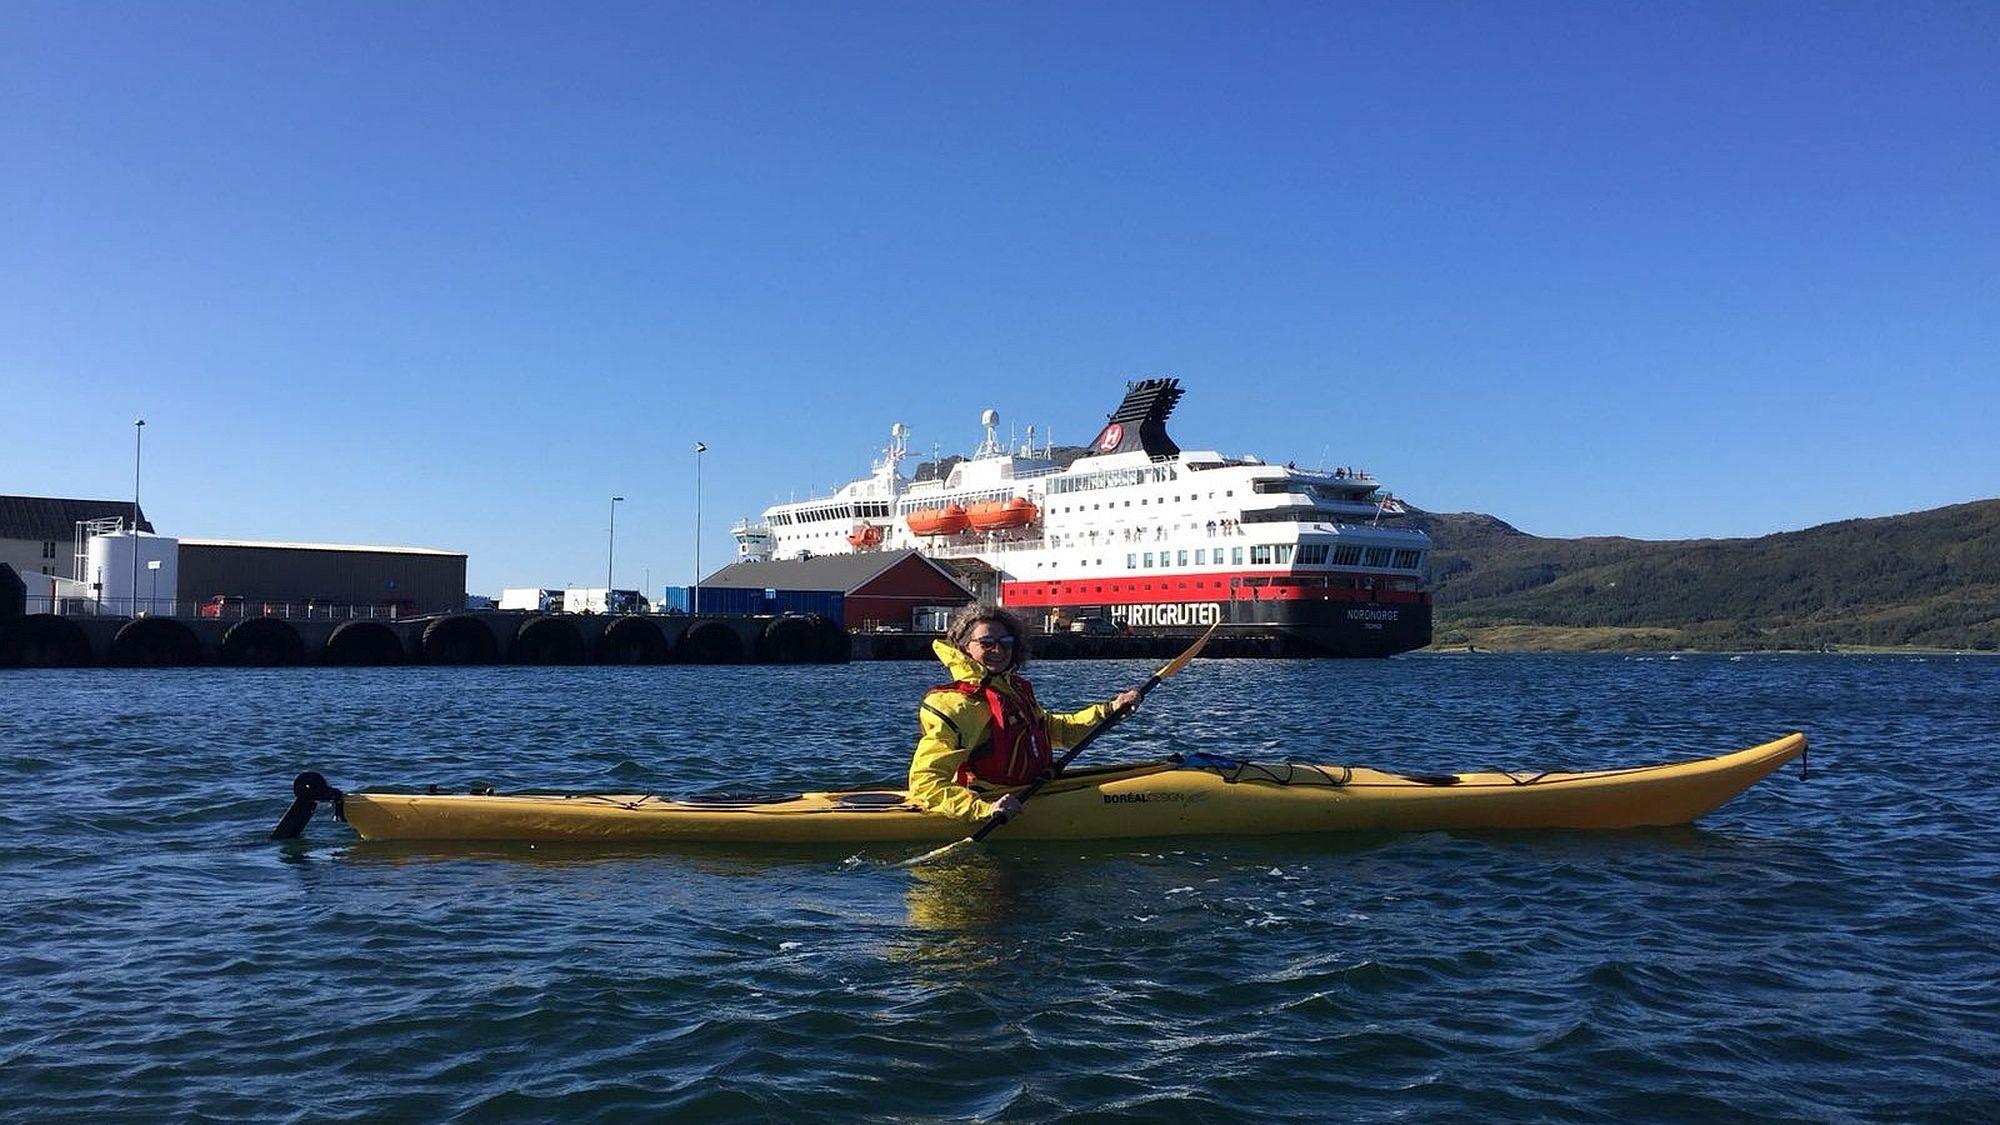 Dorle im Kajak vorm Hurtigrutenschiff